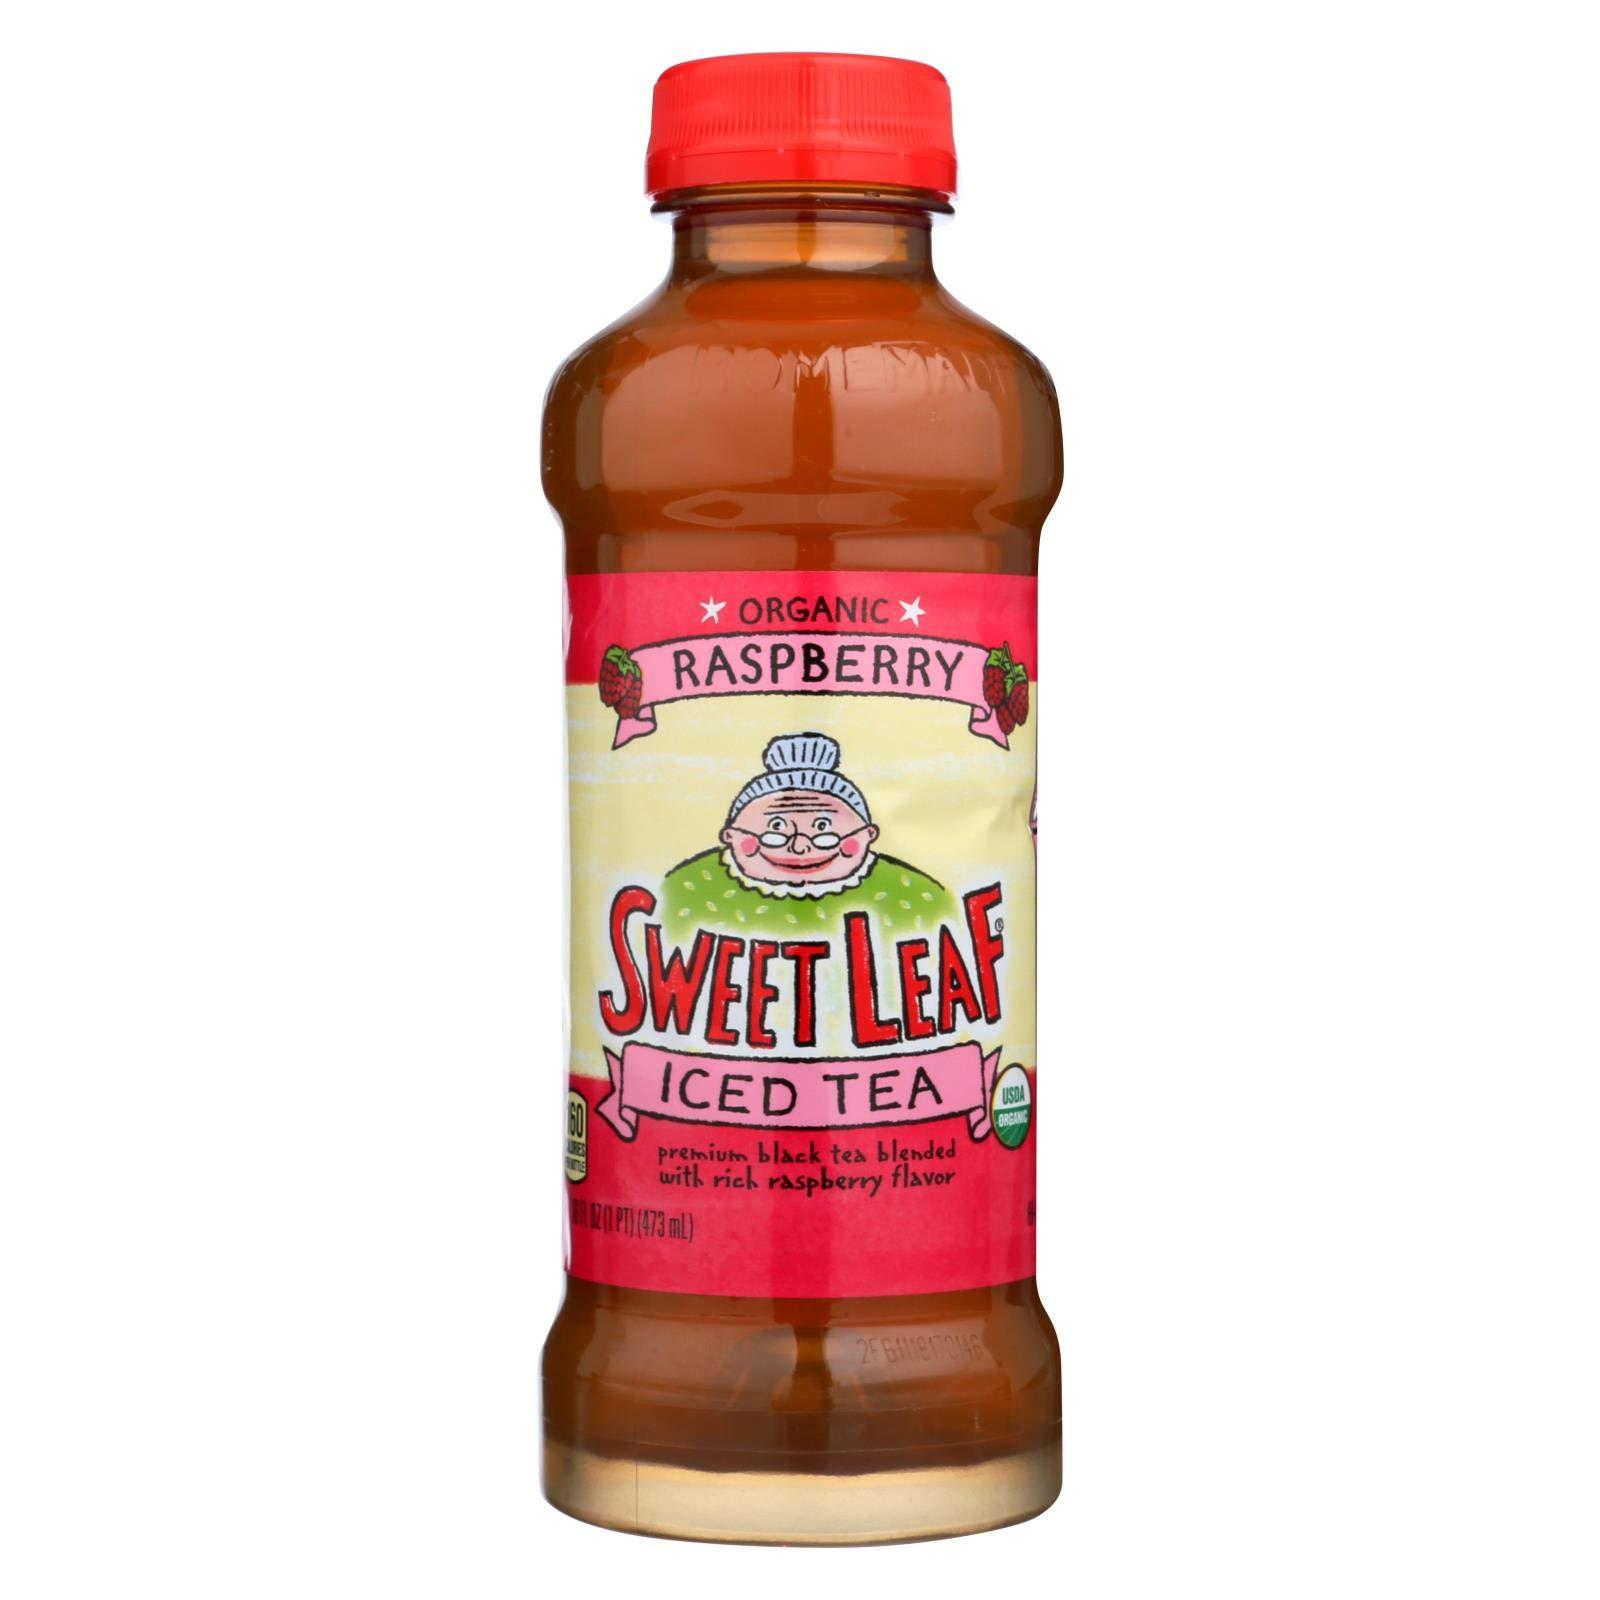 Sweet Leaf Tea Black Iced Tea - Organic Raspberry - Case of 12 - 16 Fl oz.